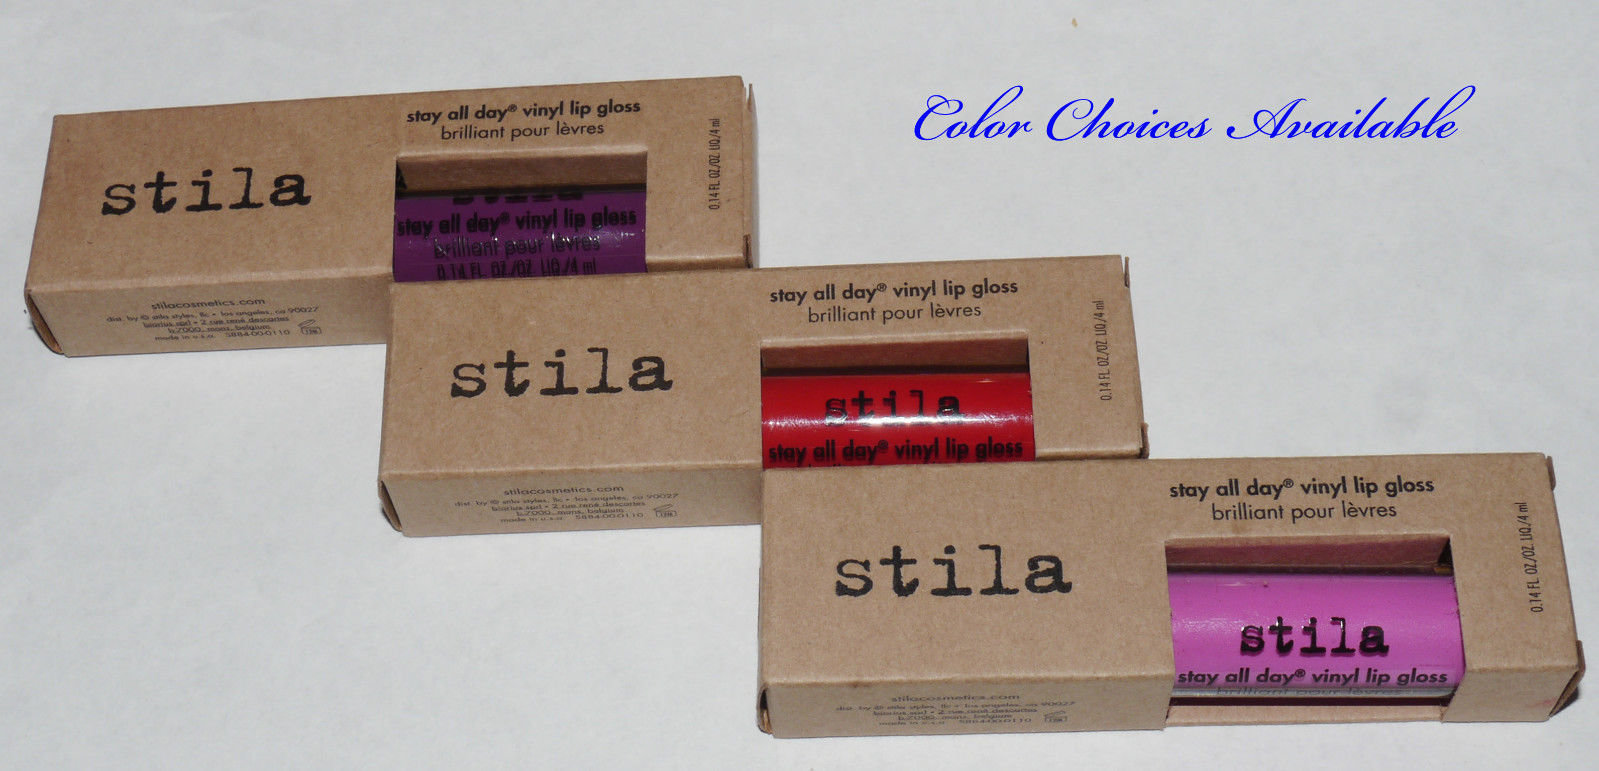 Stila Stay All Day Vinyl Lip Gloss 0.14 oz -Several Shades 14728